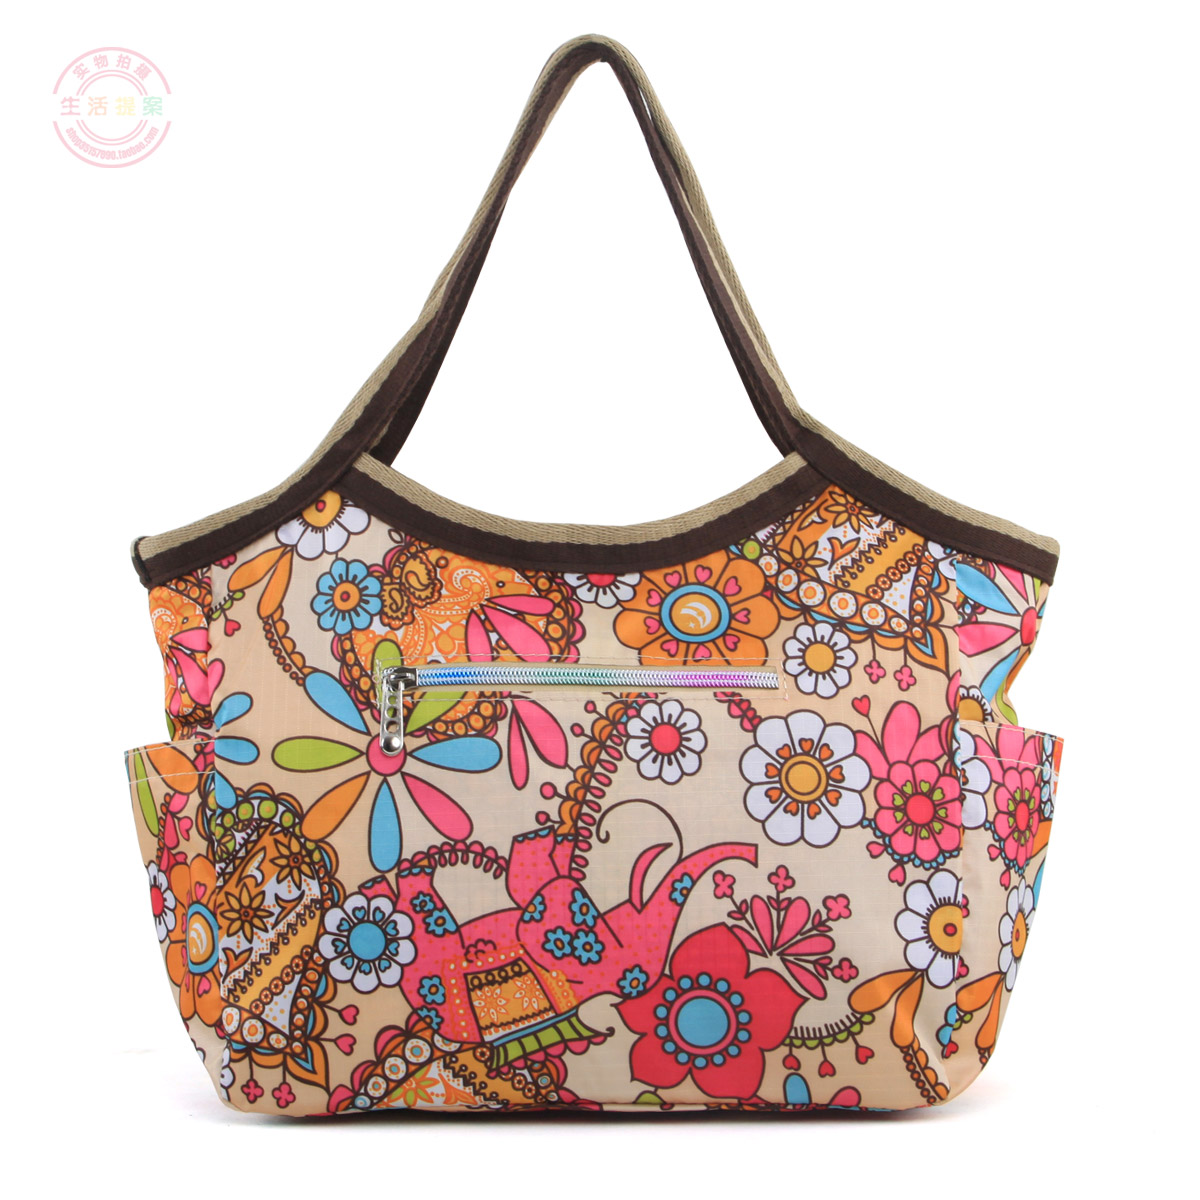 2012 waterproof nylon one shoulder handbag dumplings female Large fashion women's db32 - Brand discount store- store